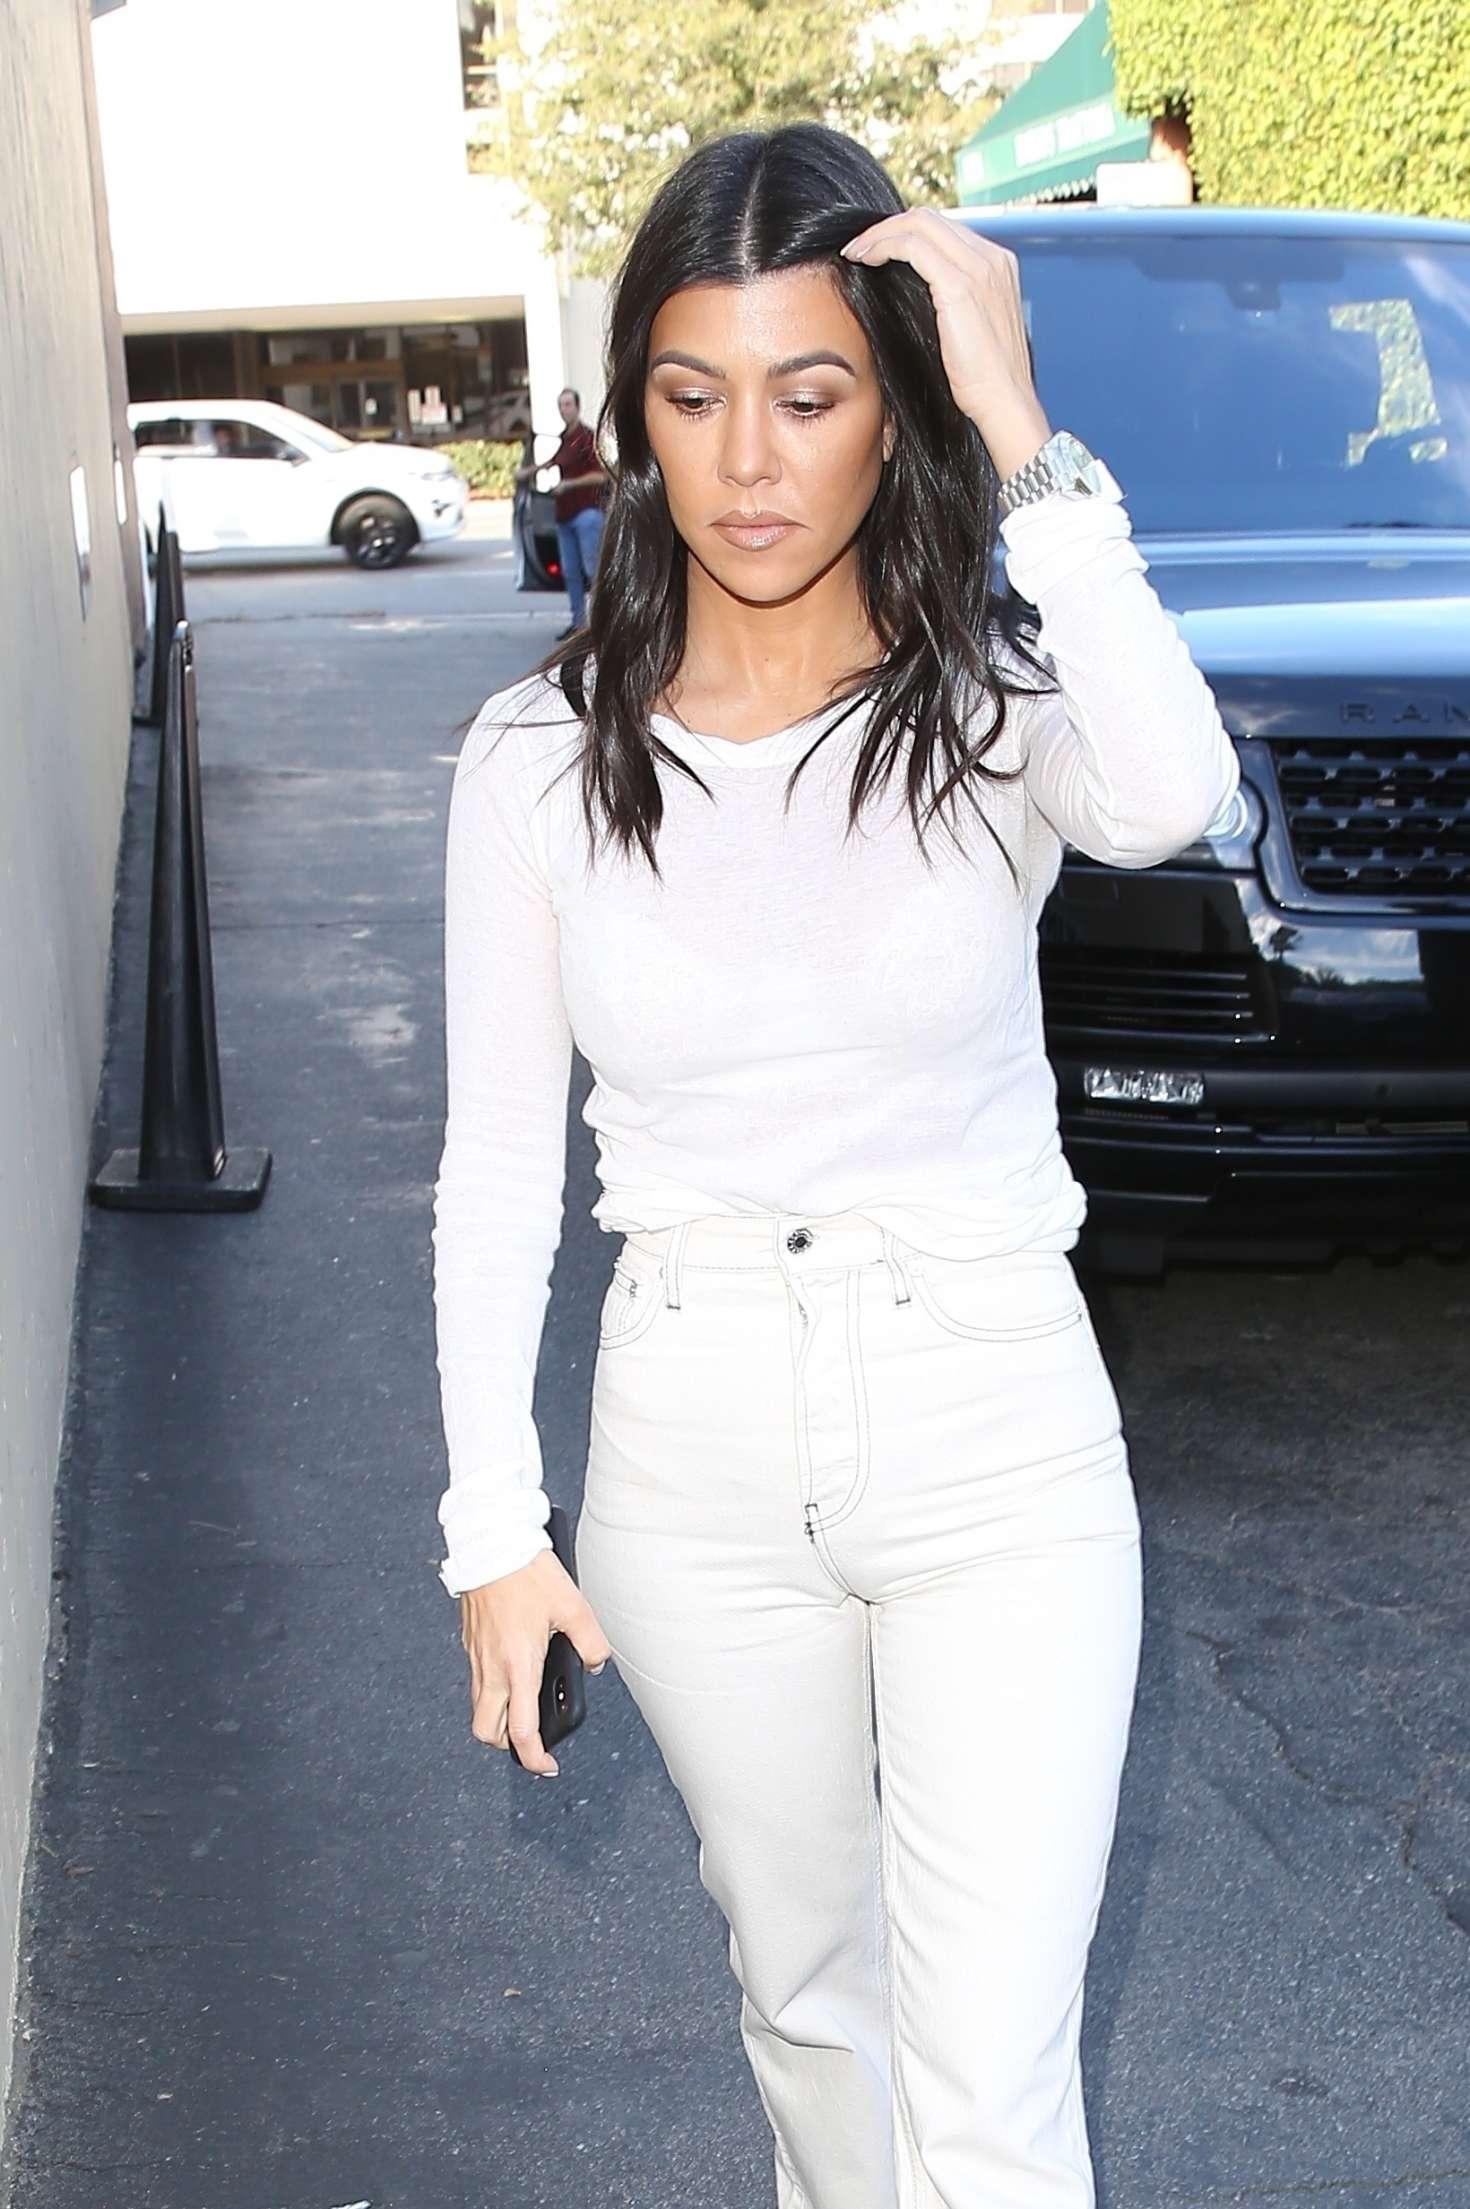 Kourtney Kardashian 2018 : Kourtney Kardashian in White -07